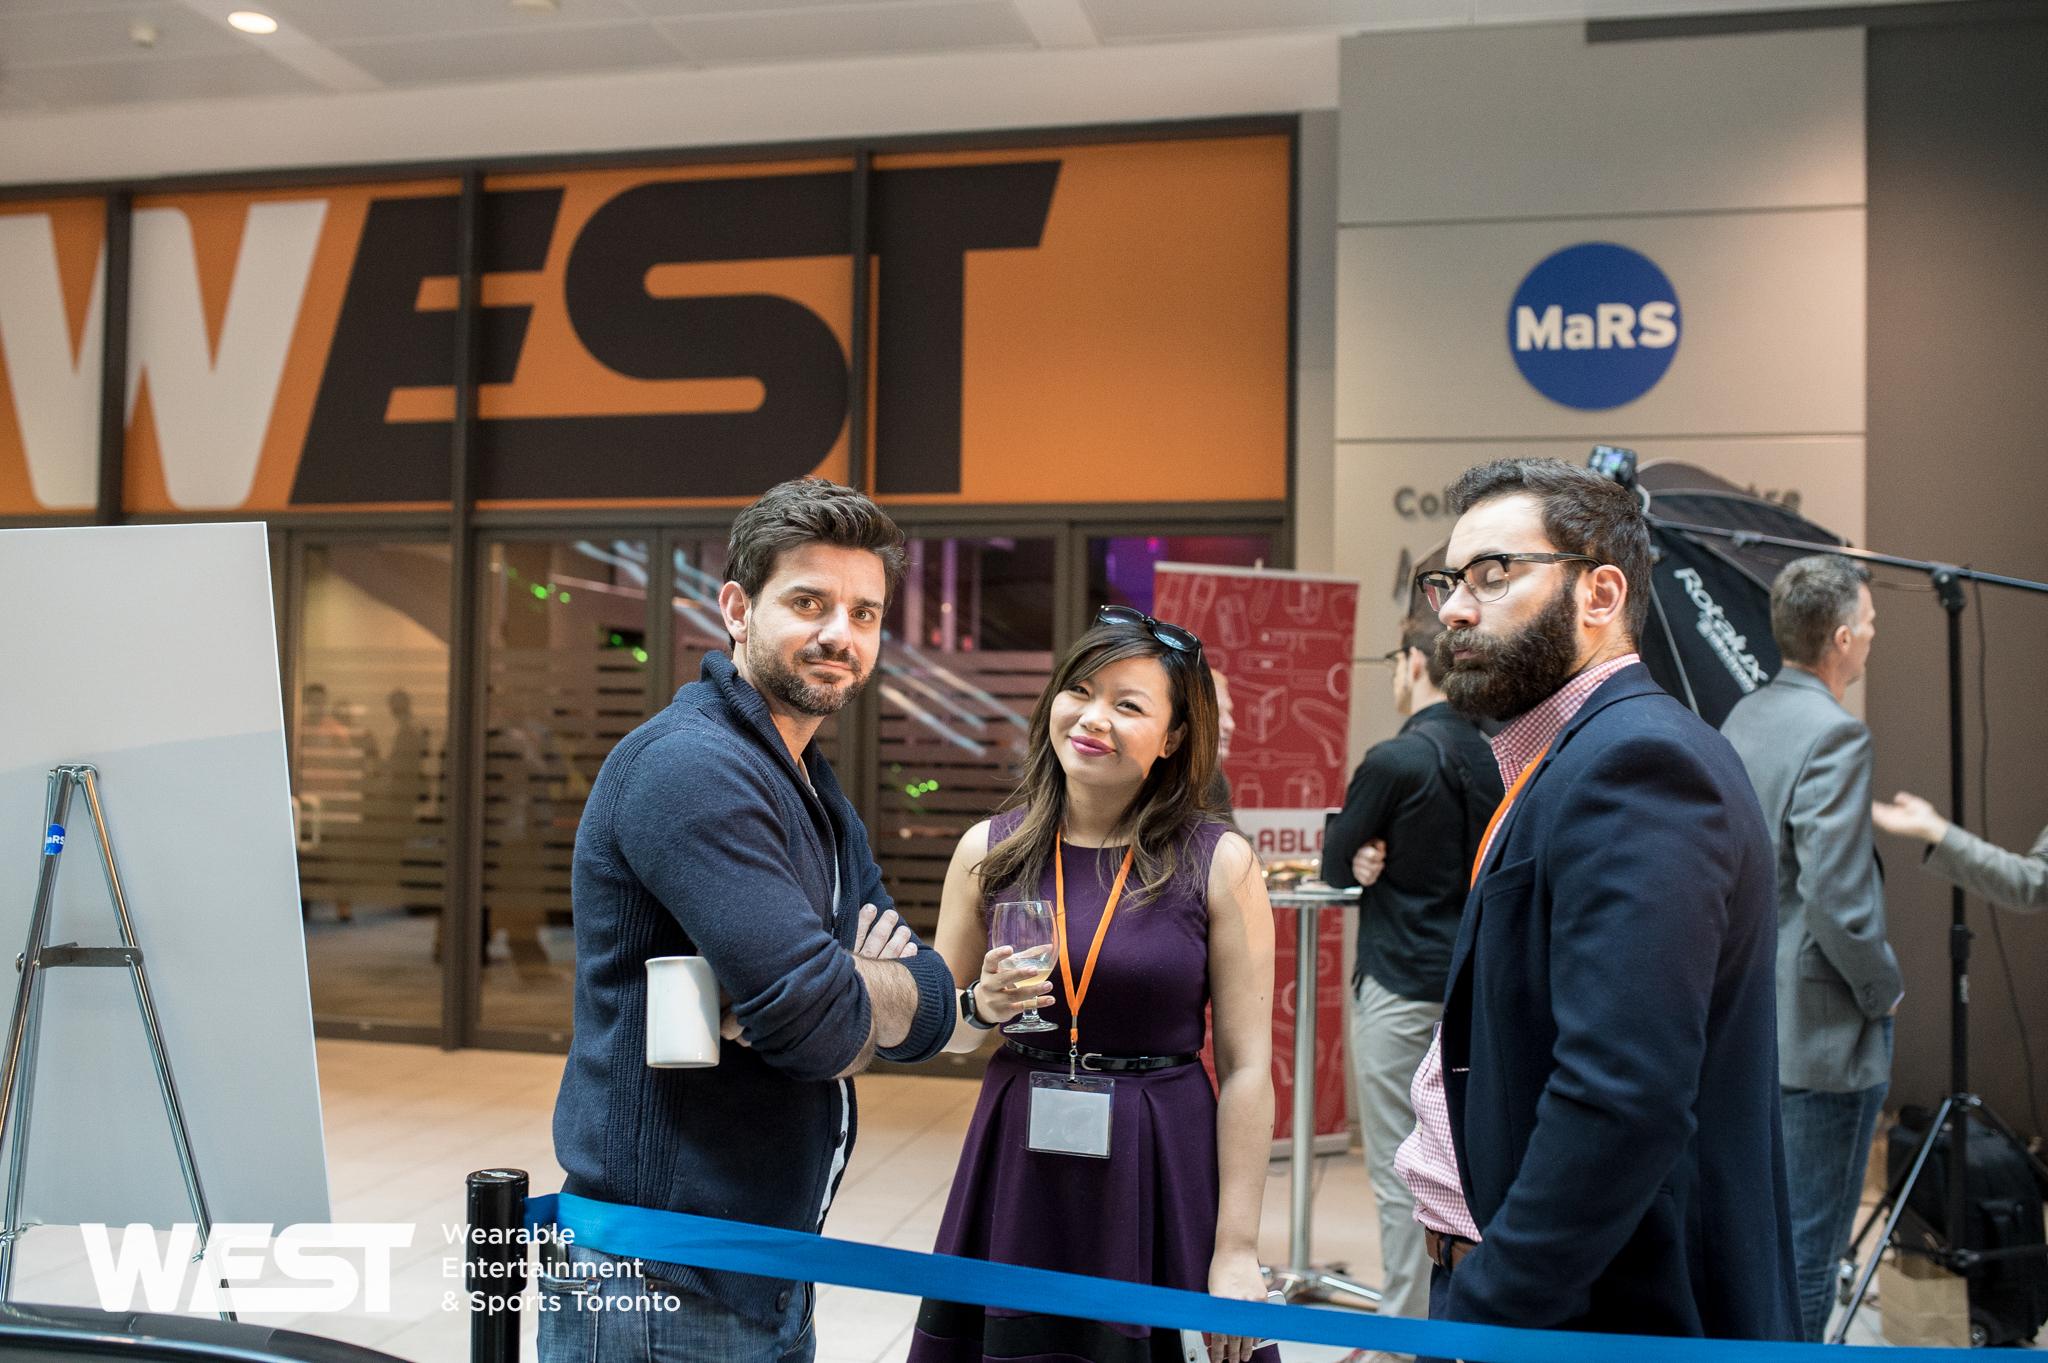 WEST2015-MaRS-Tarsipix-151103-8111.jpg